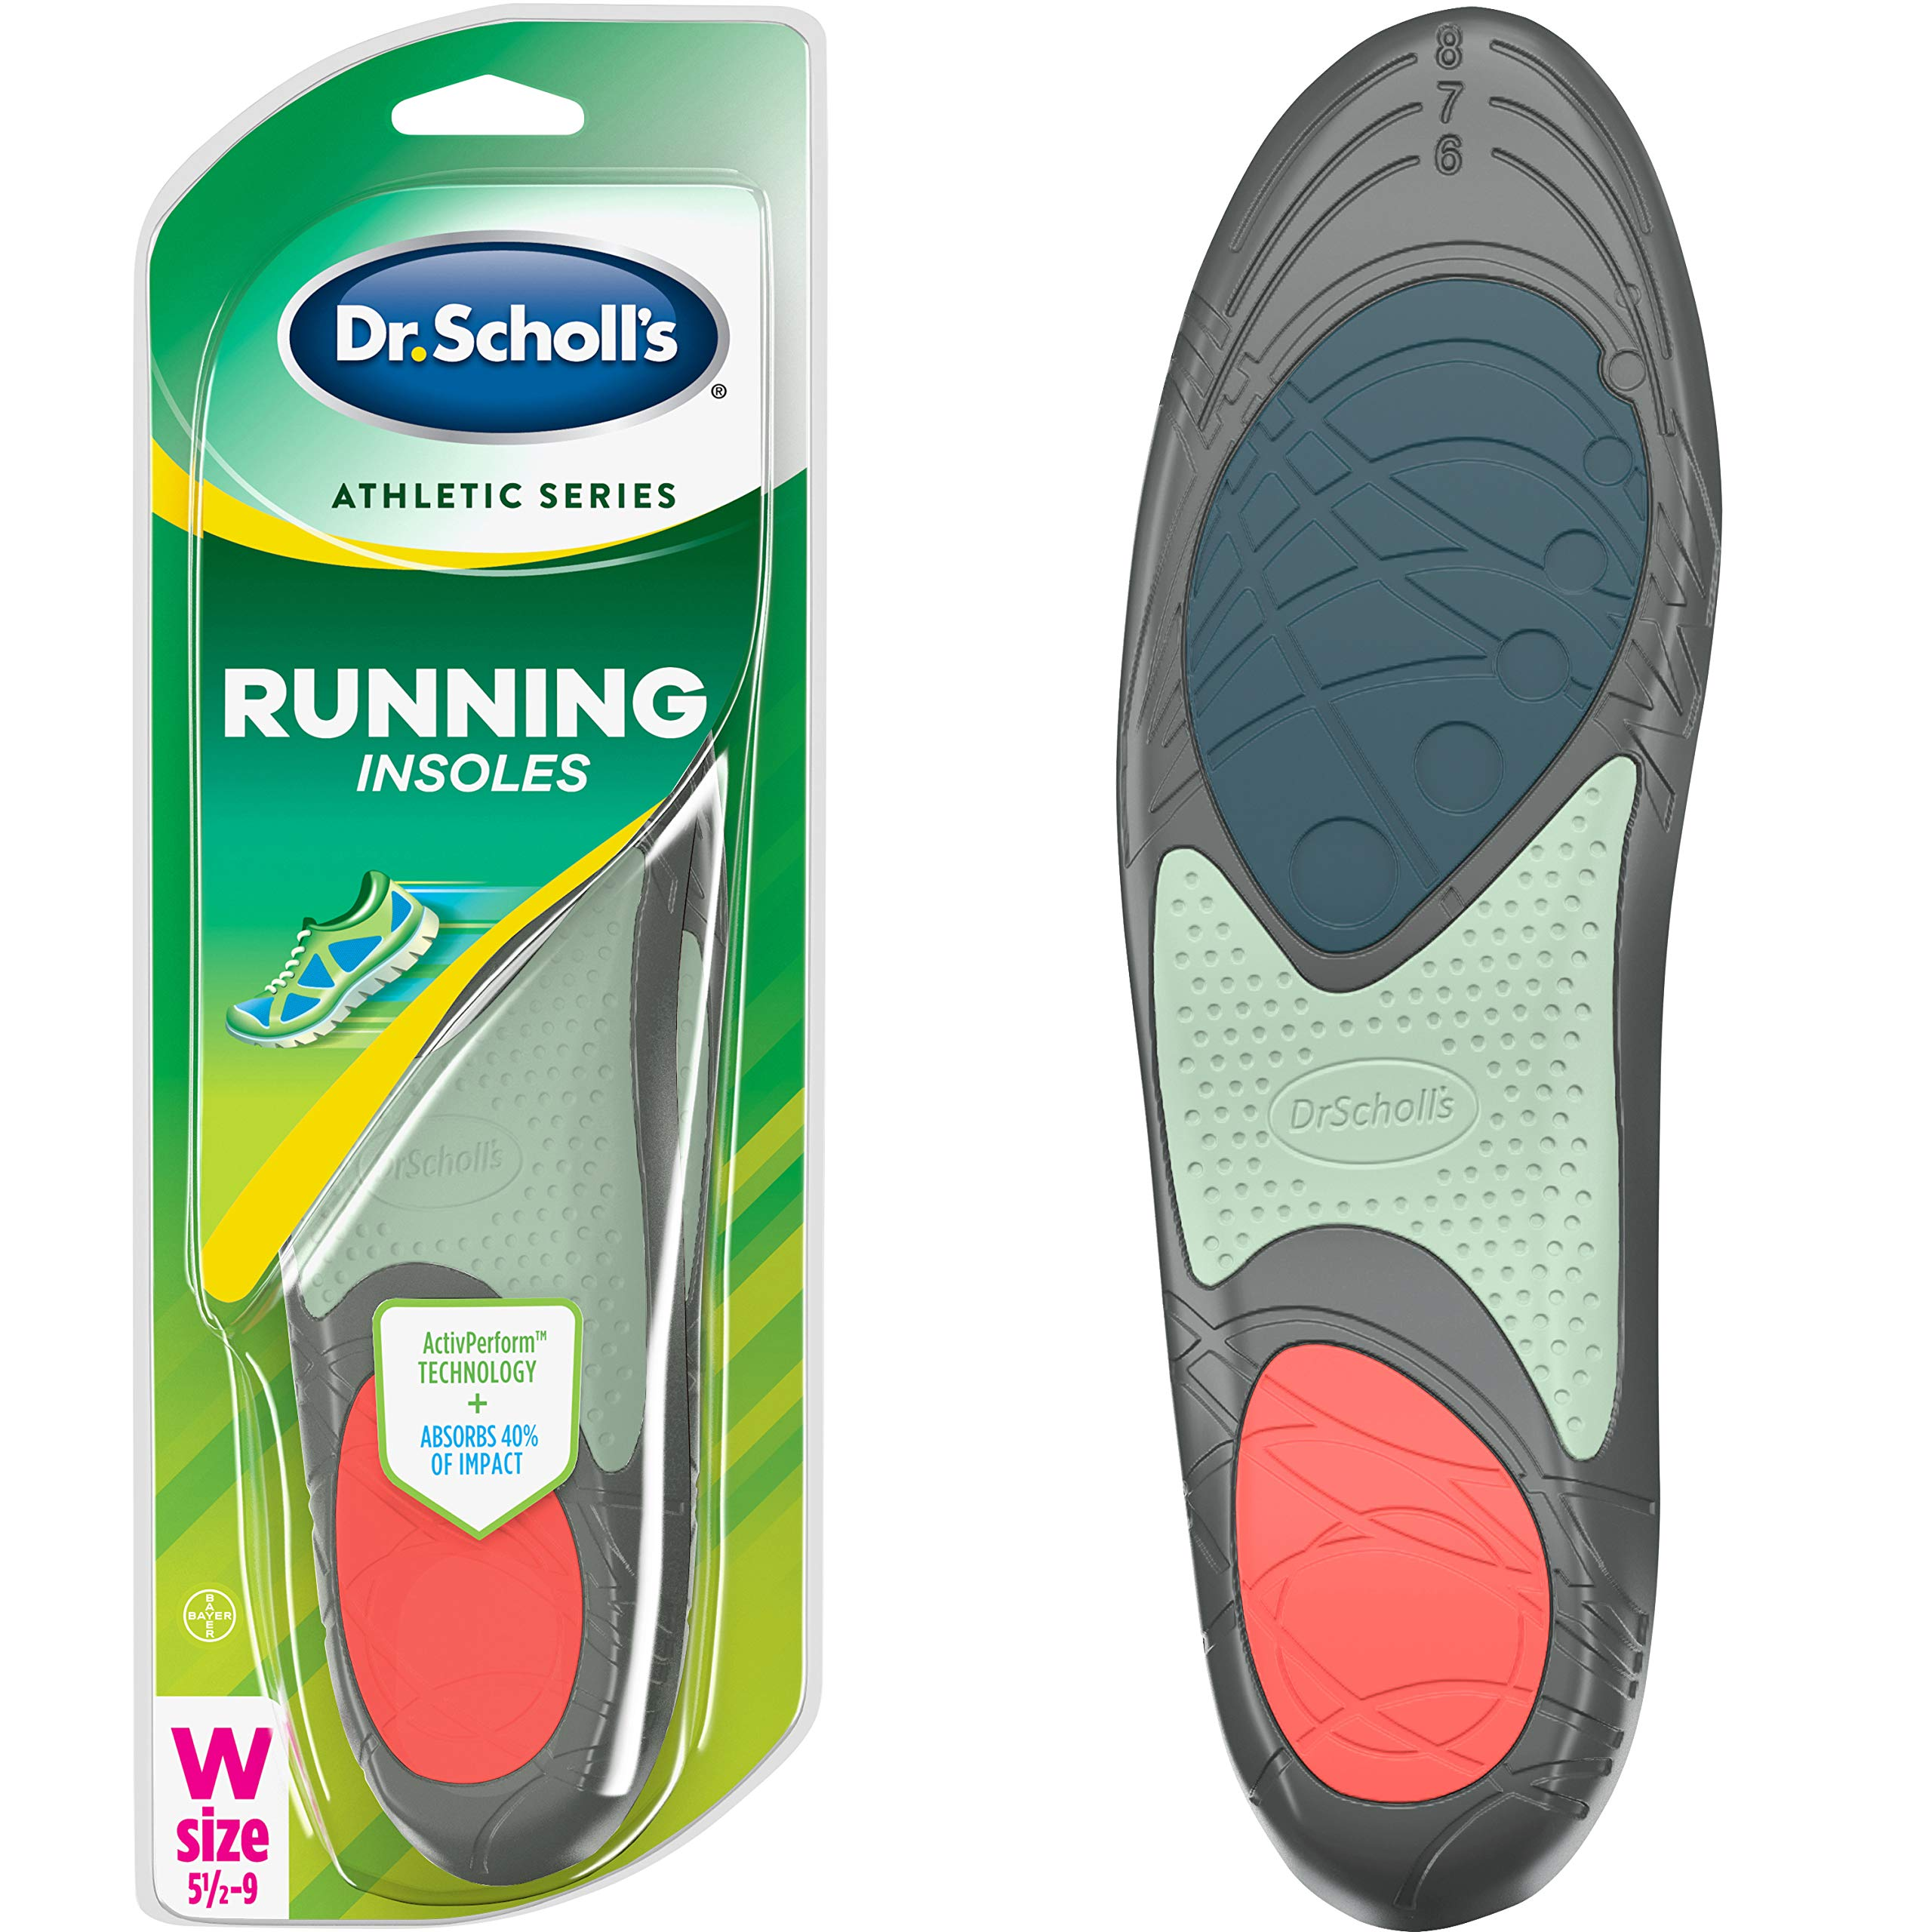 Dr Scholls Athletic Running Insoles